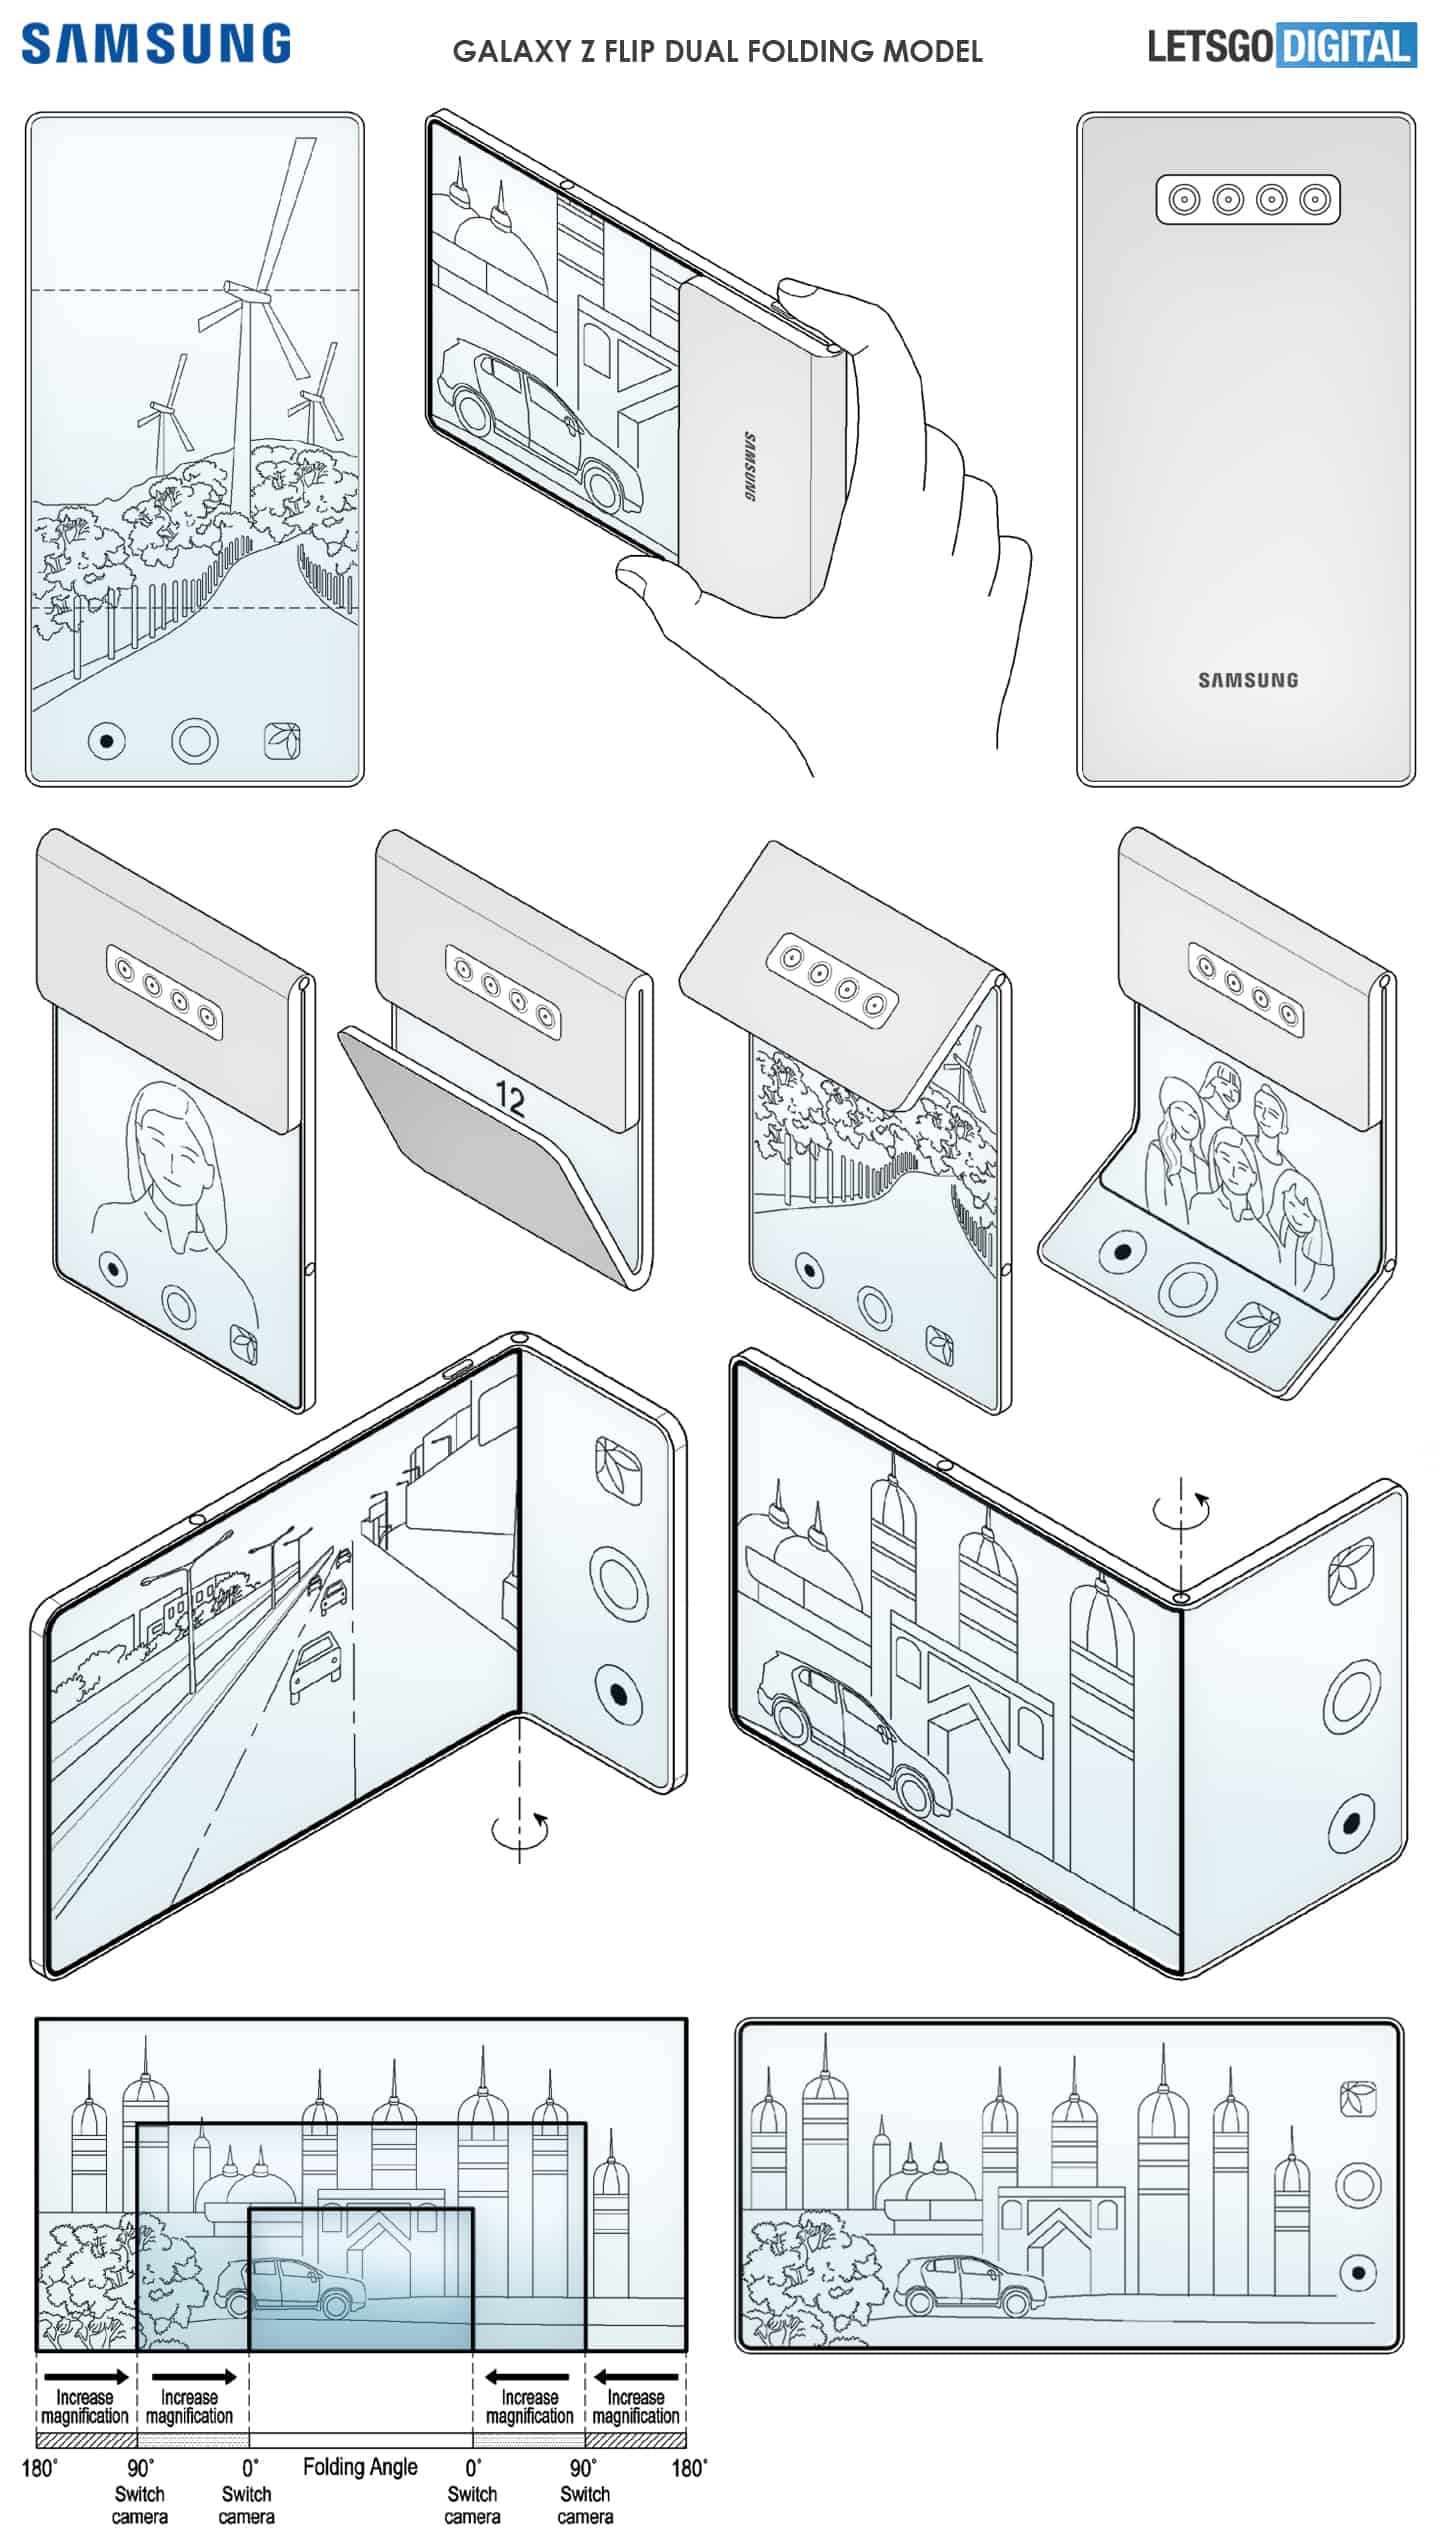 Samsung tri fold patent 3